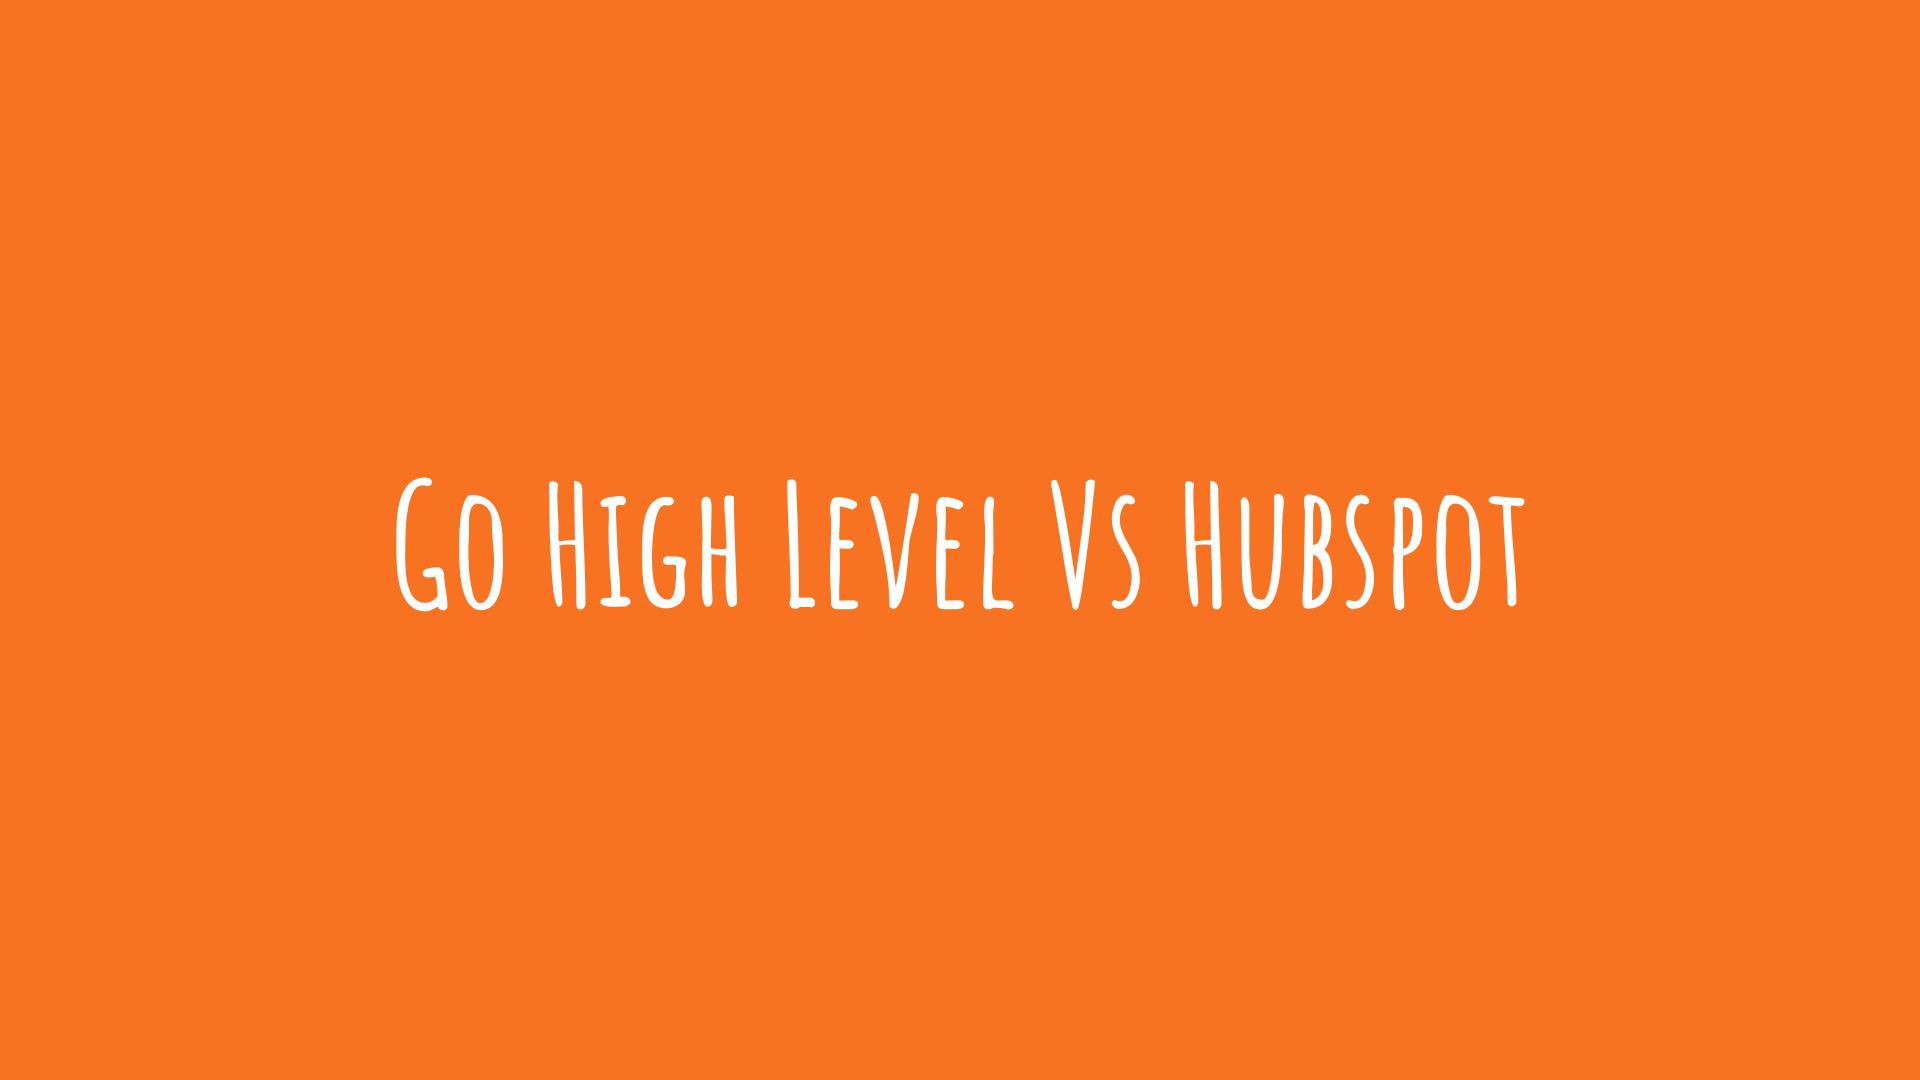 go high level vs hubspot